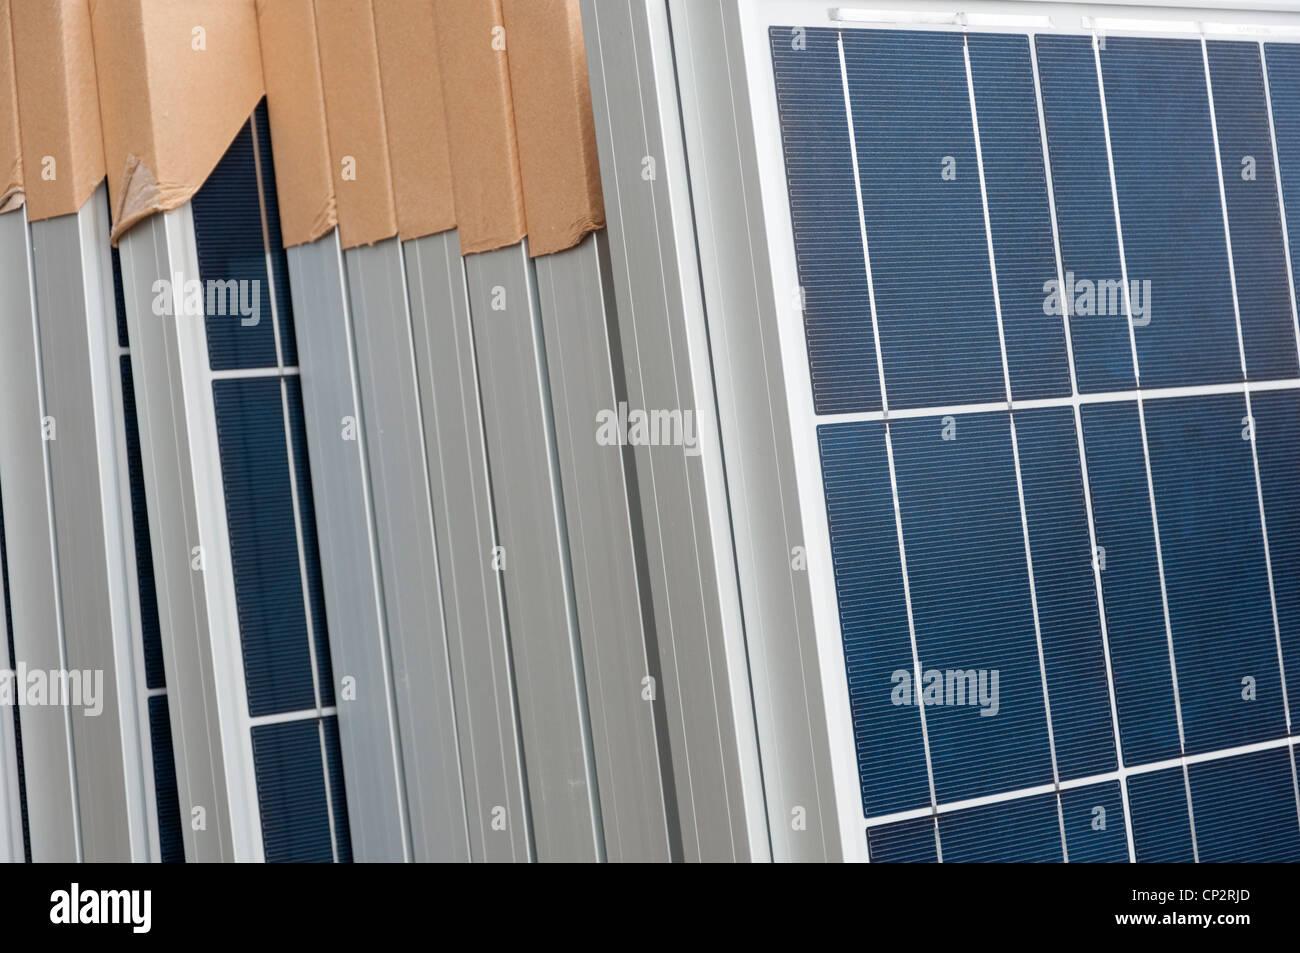 Solar Panel Home Uk Stock Photos & Solar Panel Home Uk Stock Images ...